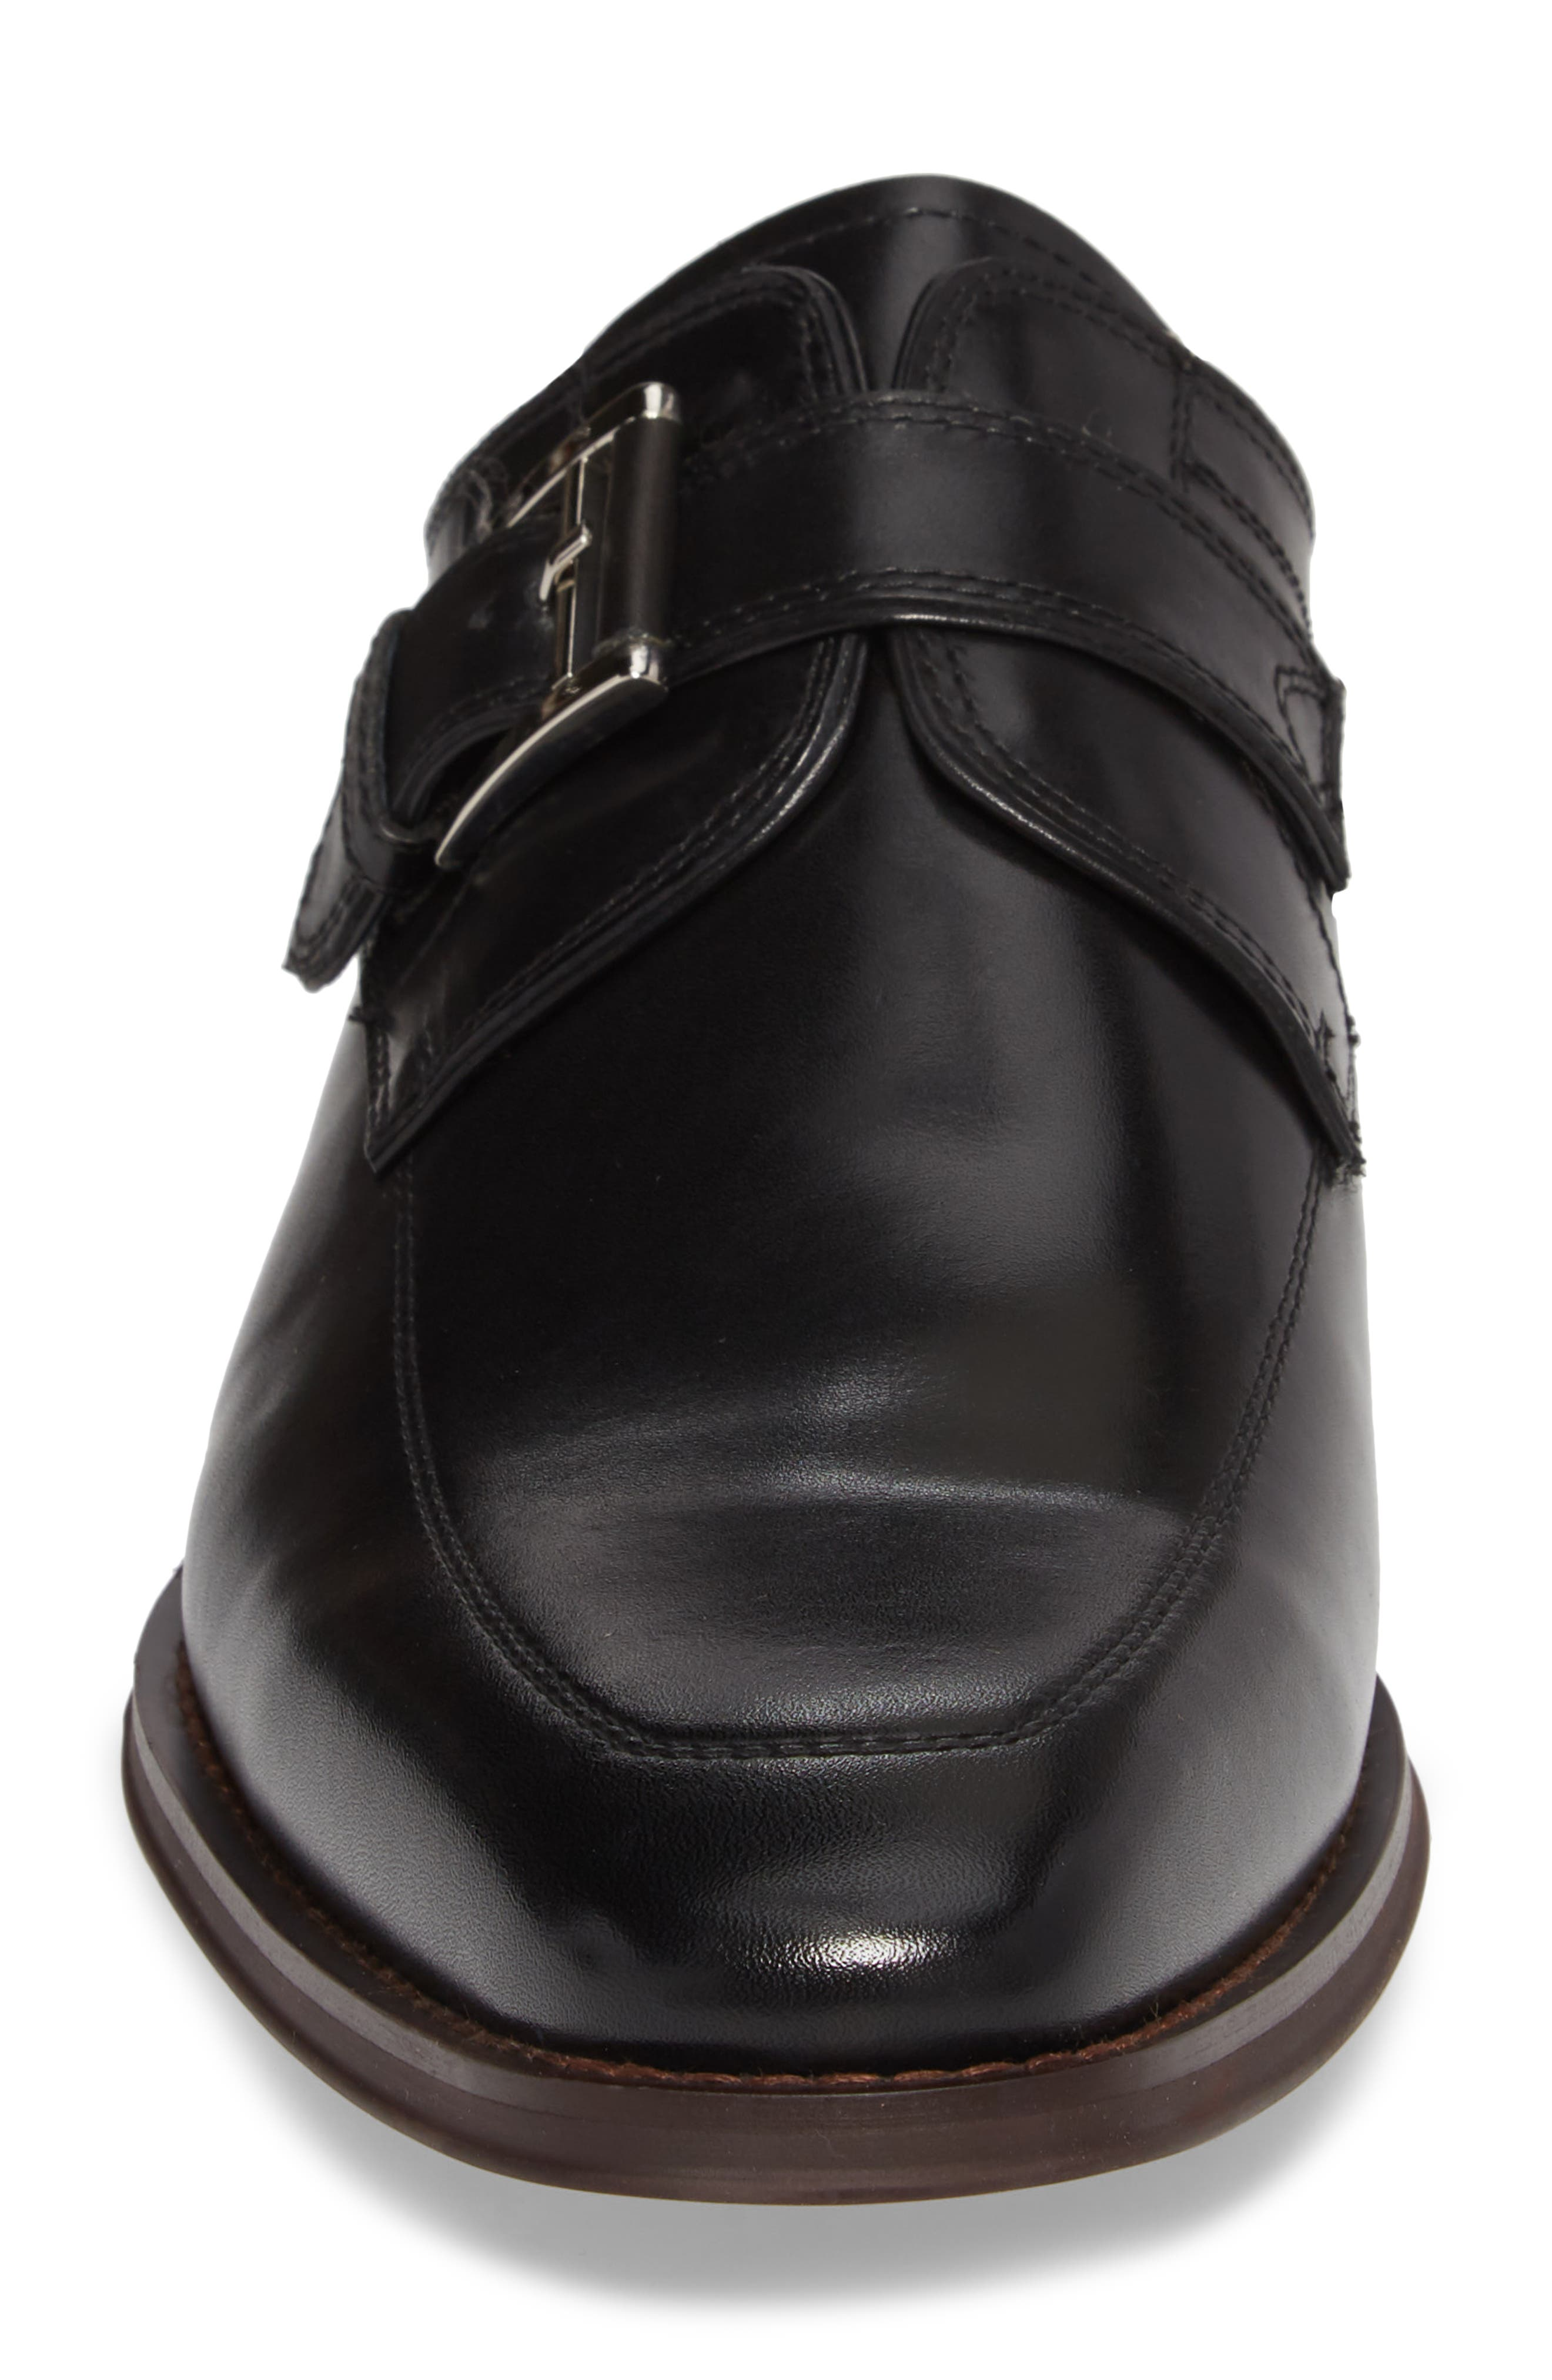 Merlot Single Buckle Monk Shoe,                             Alternate thumbnail 4, color,                             BLACK LEATHER